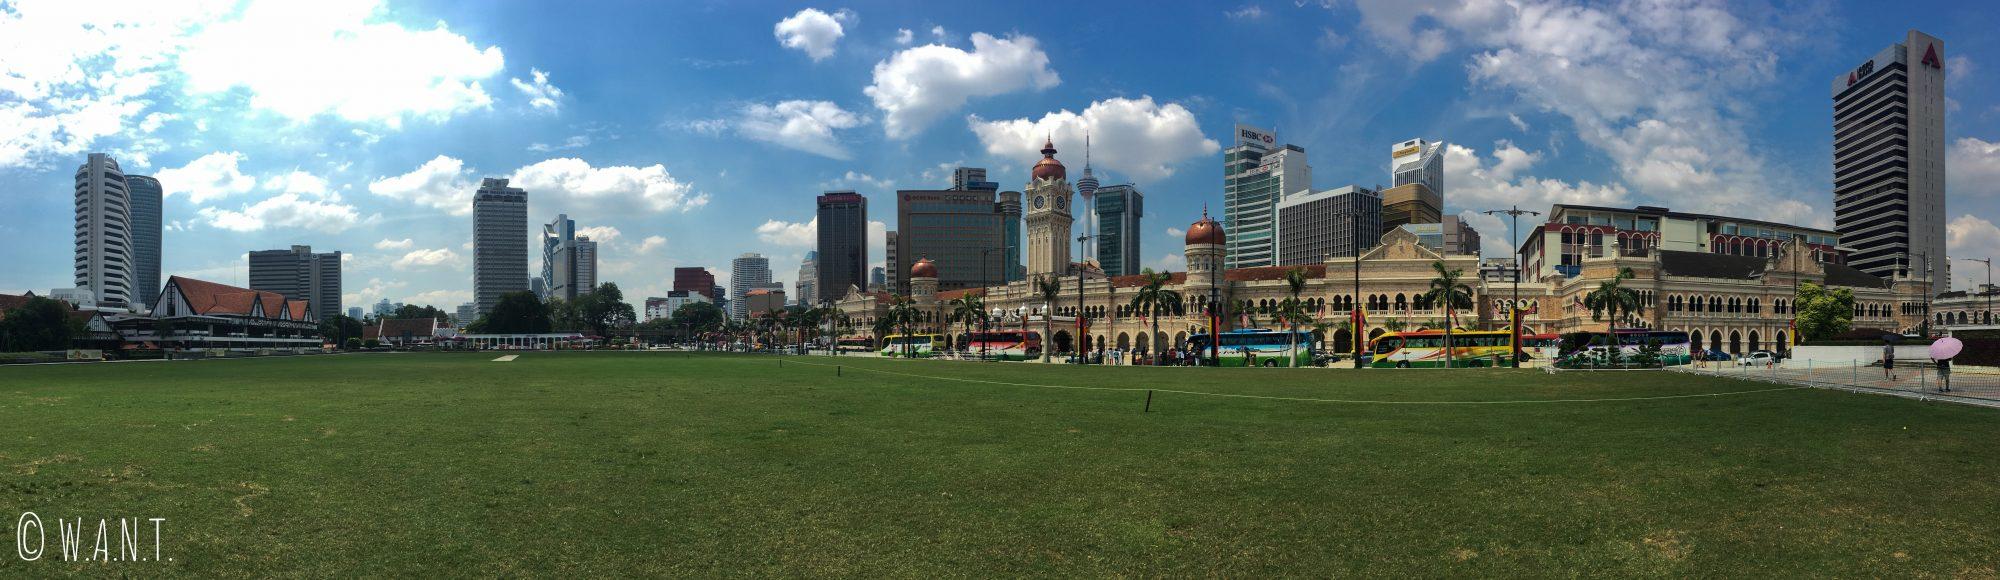 Panorama de Merdeka Square à Kuala Lumpur